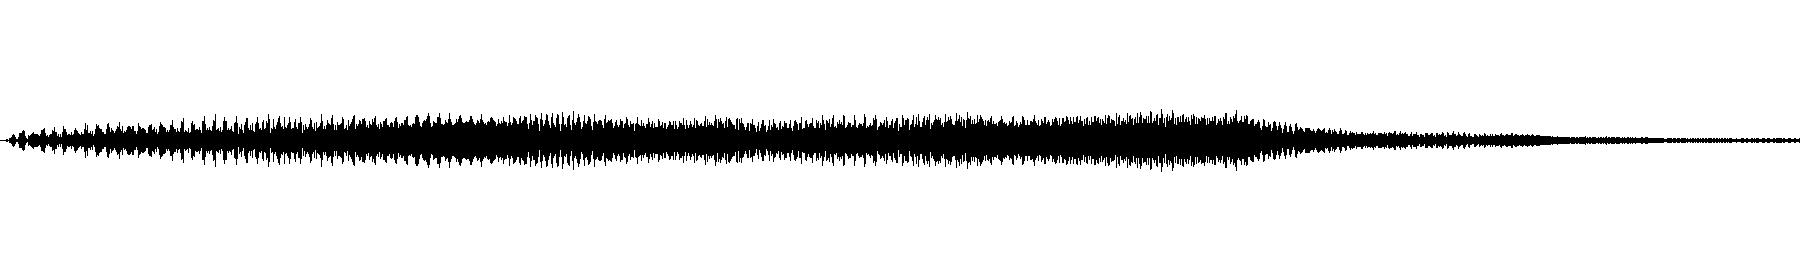 vocal chop 3